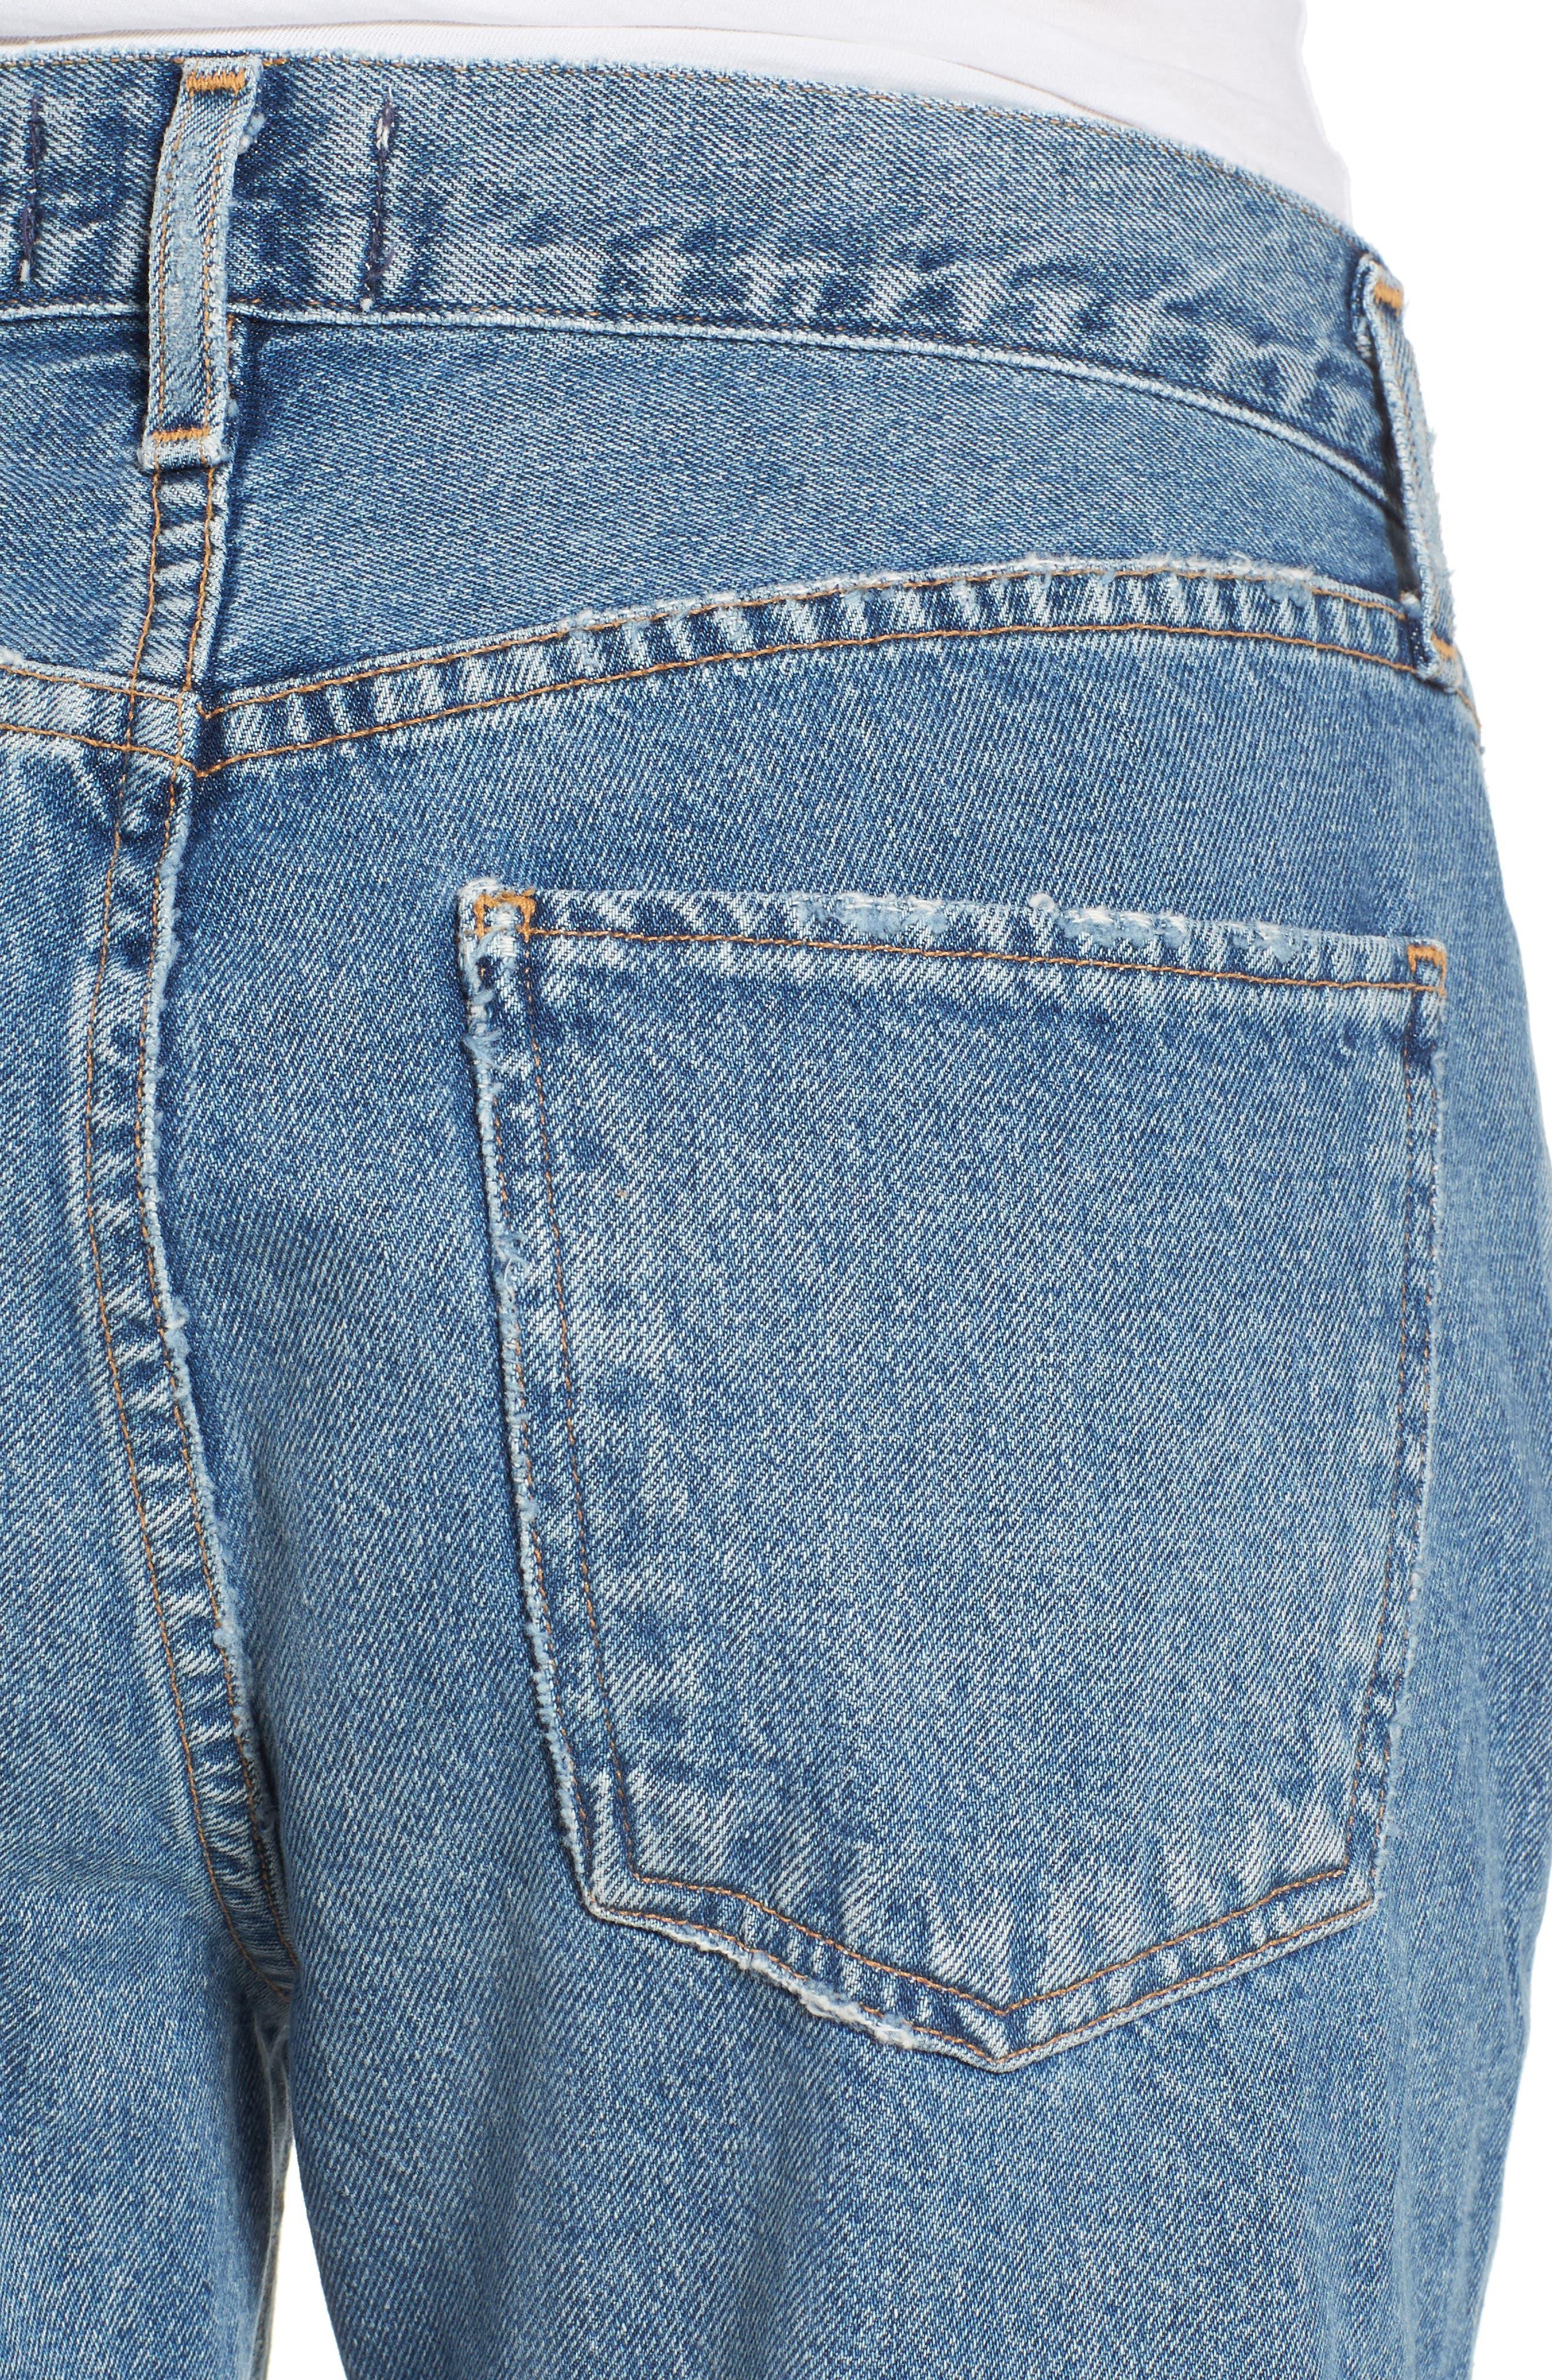 Cigarette High Waist Jeans,                             Alternate thumbnail 4, color,                             PASSENGER